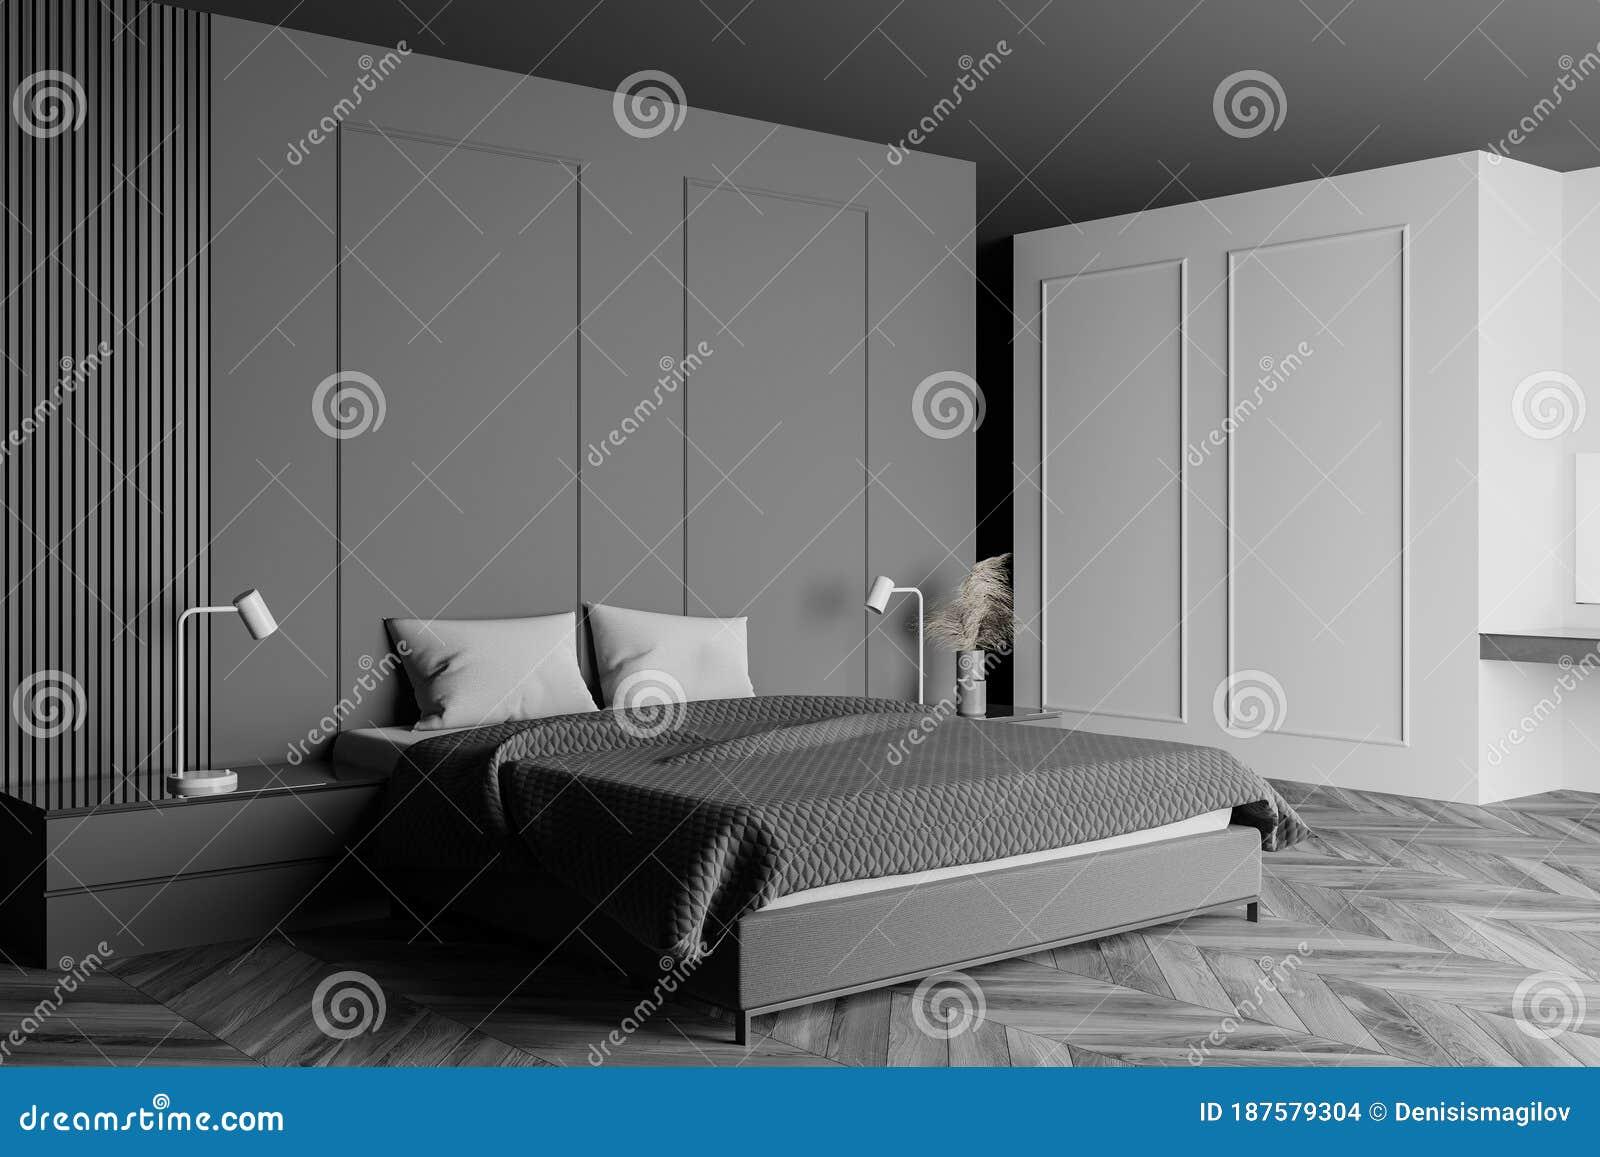 Grey And White Master Bedroom Corner Stock Illustration Illustration Of Living Decor 187579304